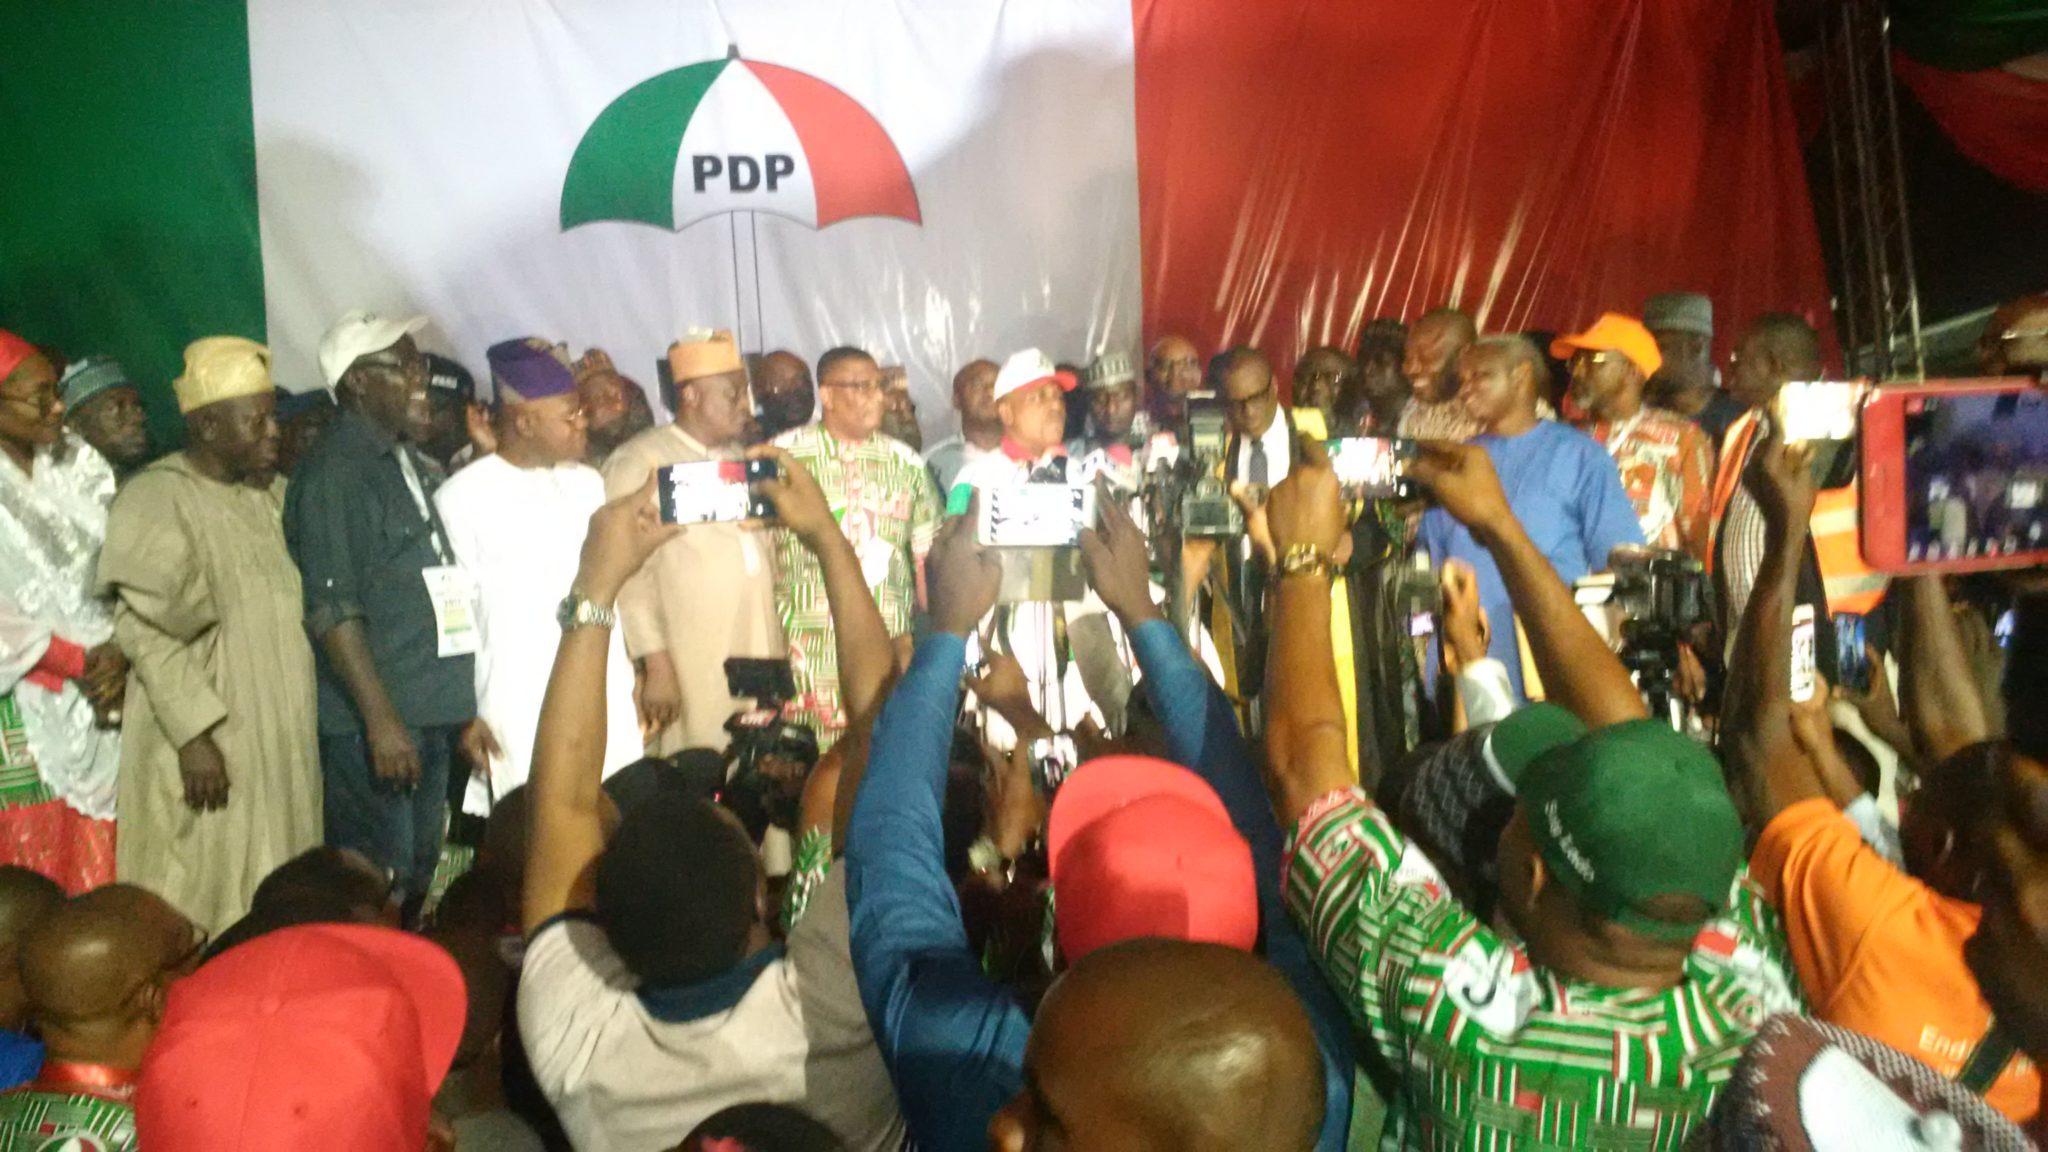 BREAKING: PDP: Uche Secondus, new national chairman